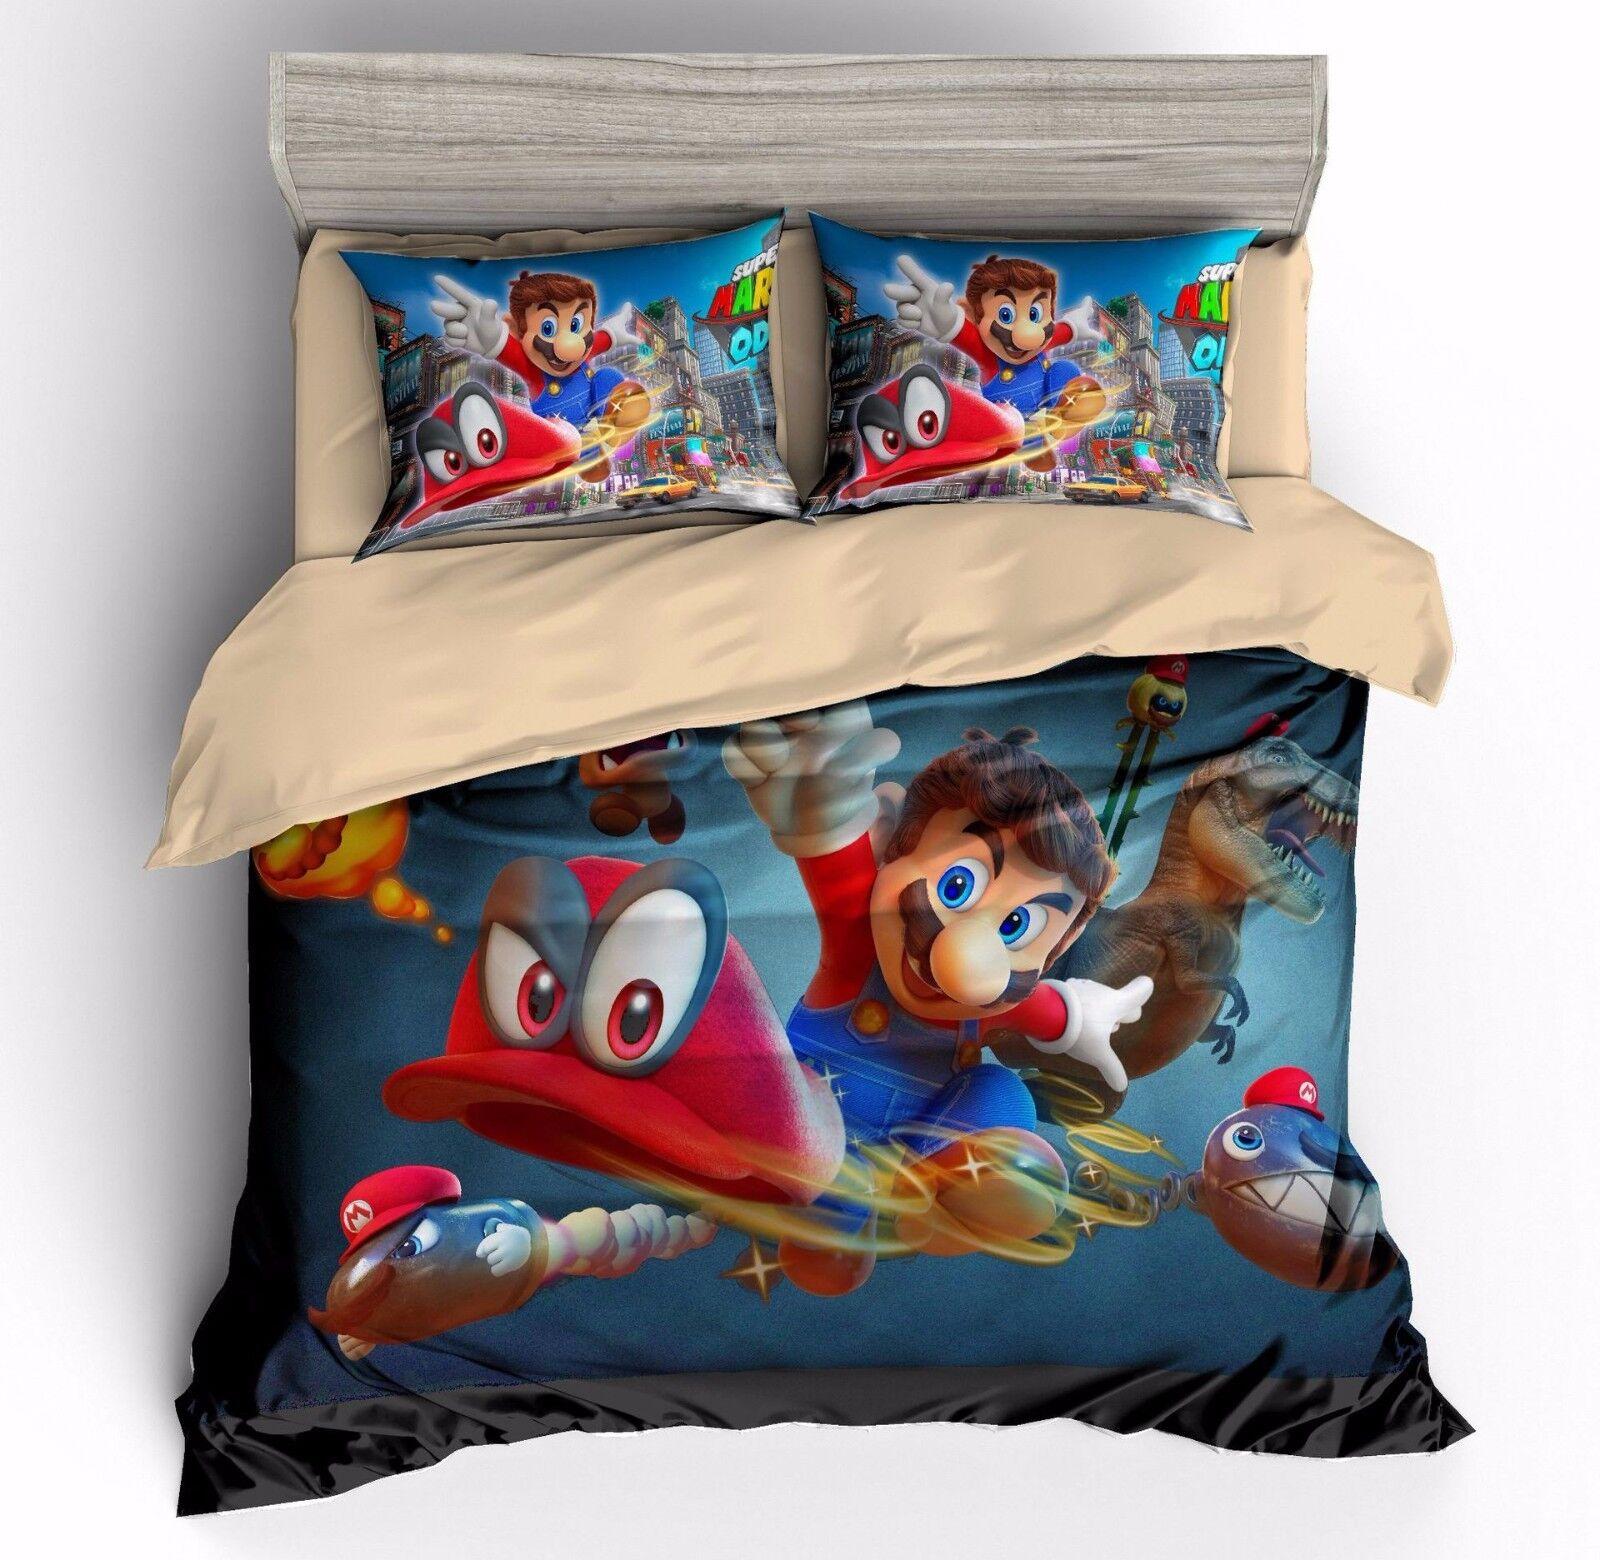 3D Super Mario Odyssey Kids Bedding Zip Quilt Cover Sets Duvet Cover Pillow Case